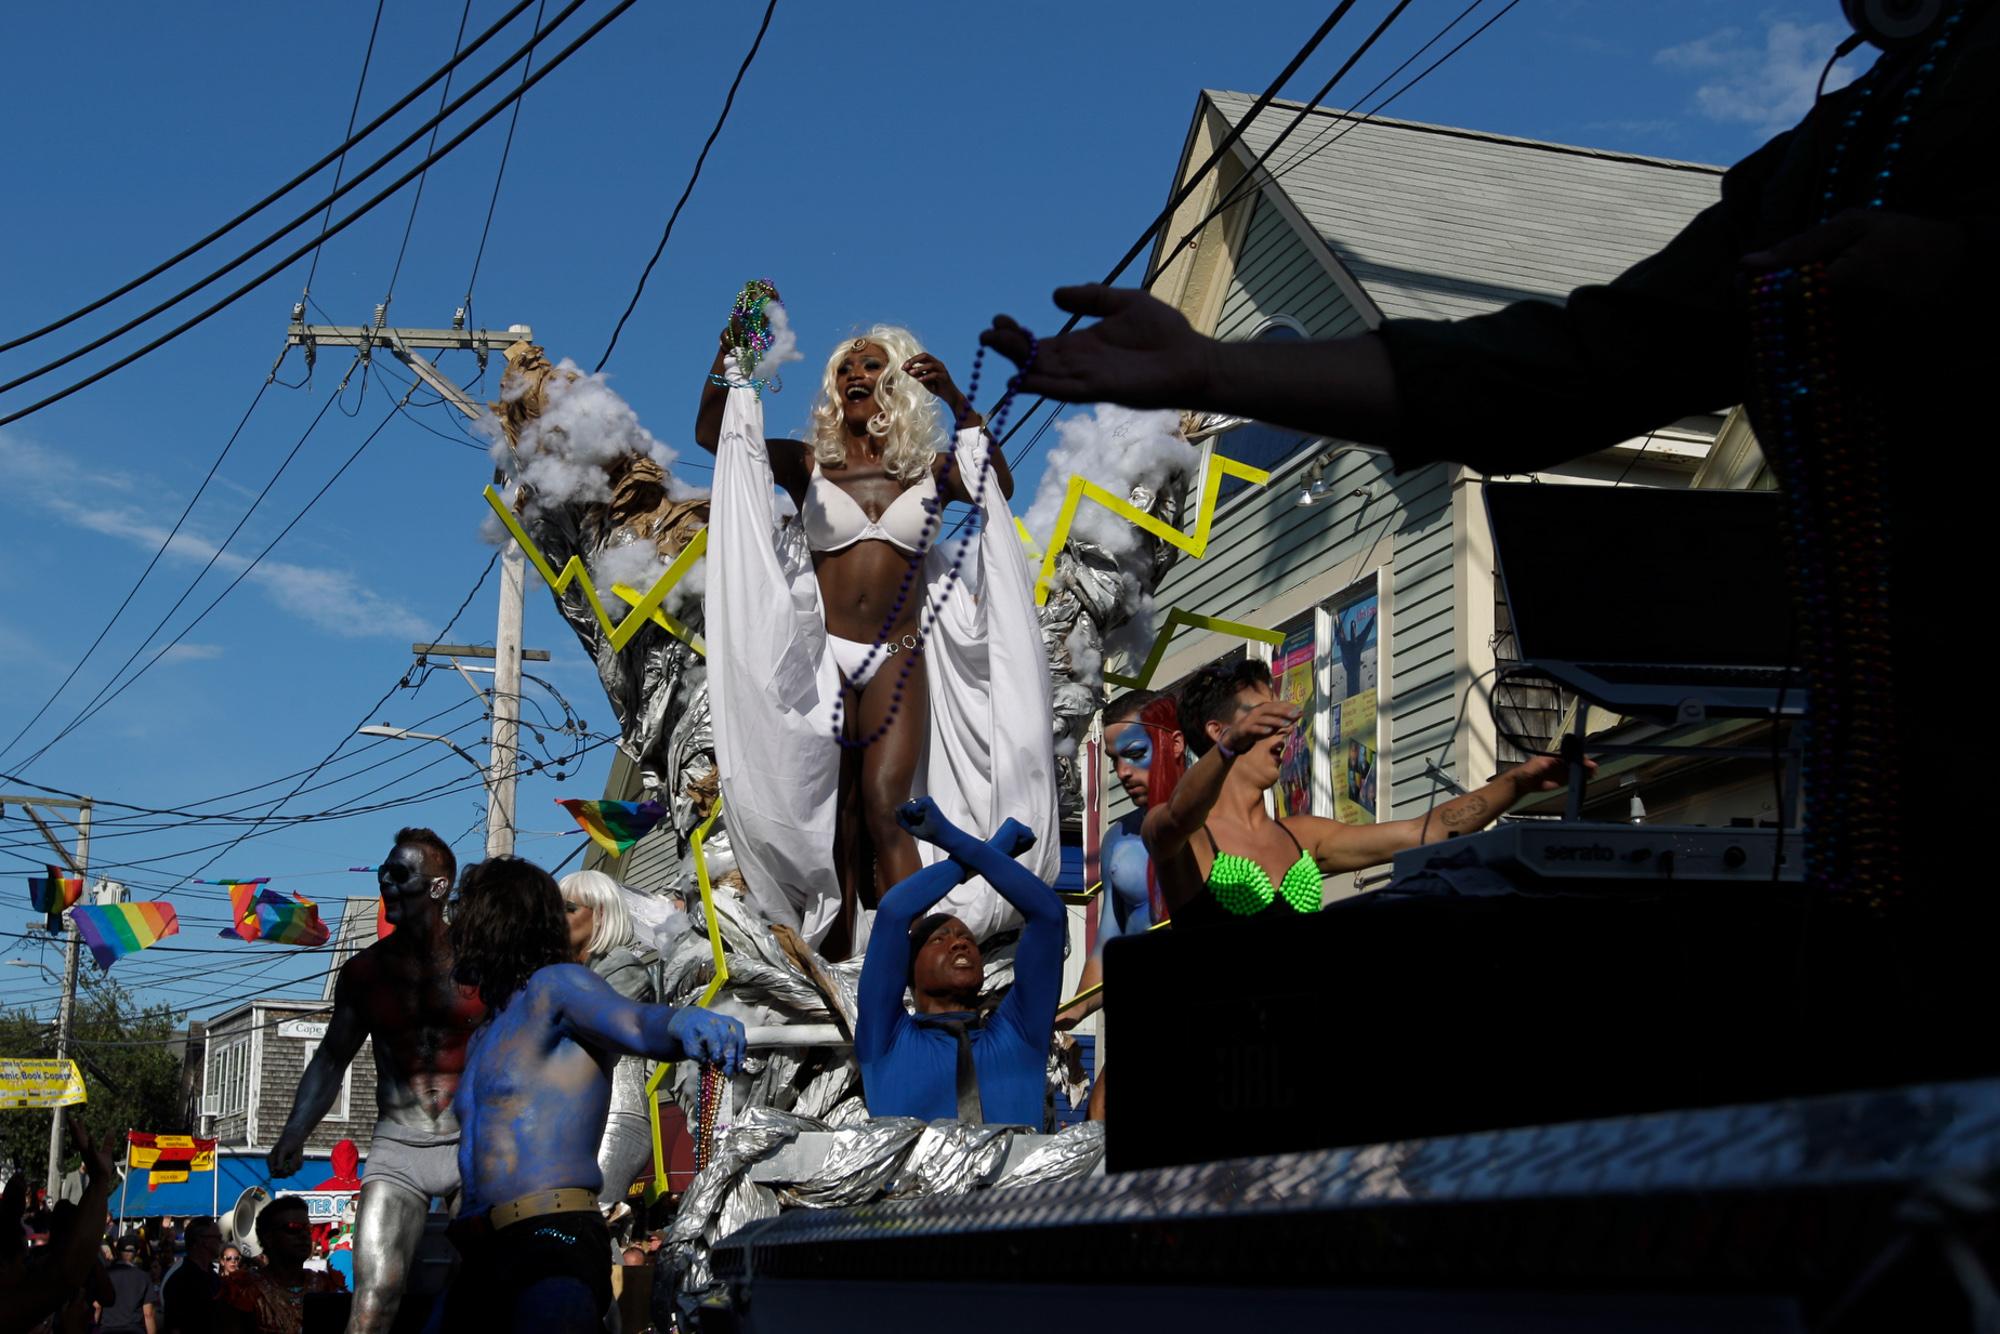 Ptown_Carnival-14.jpg